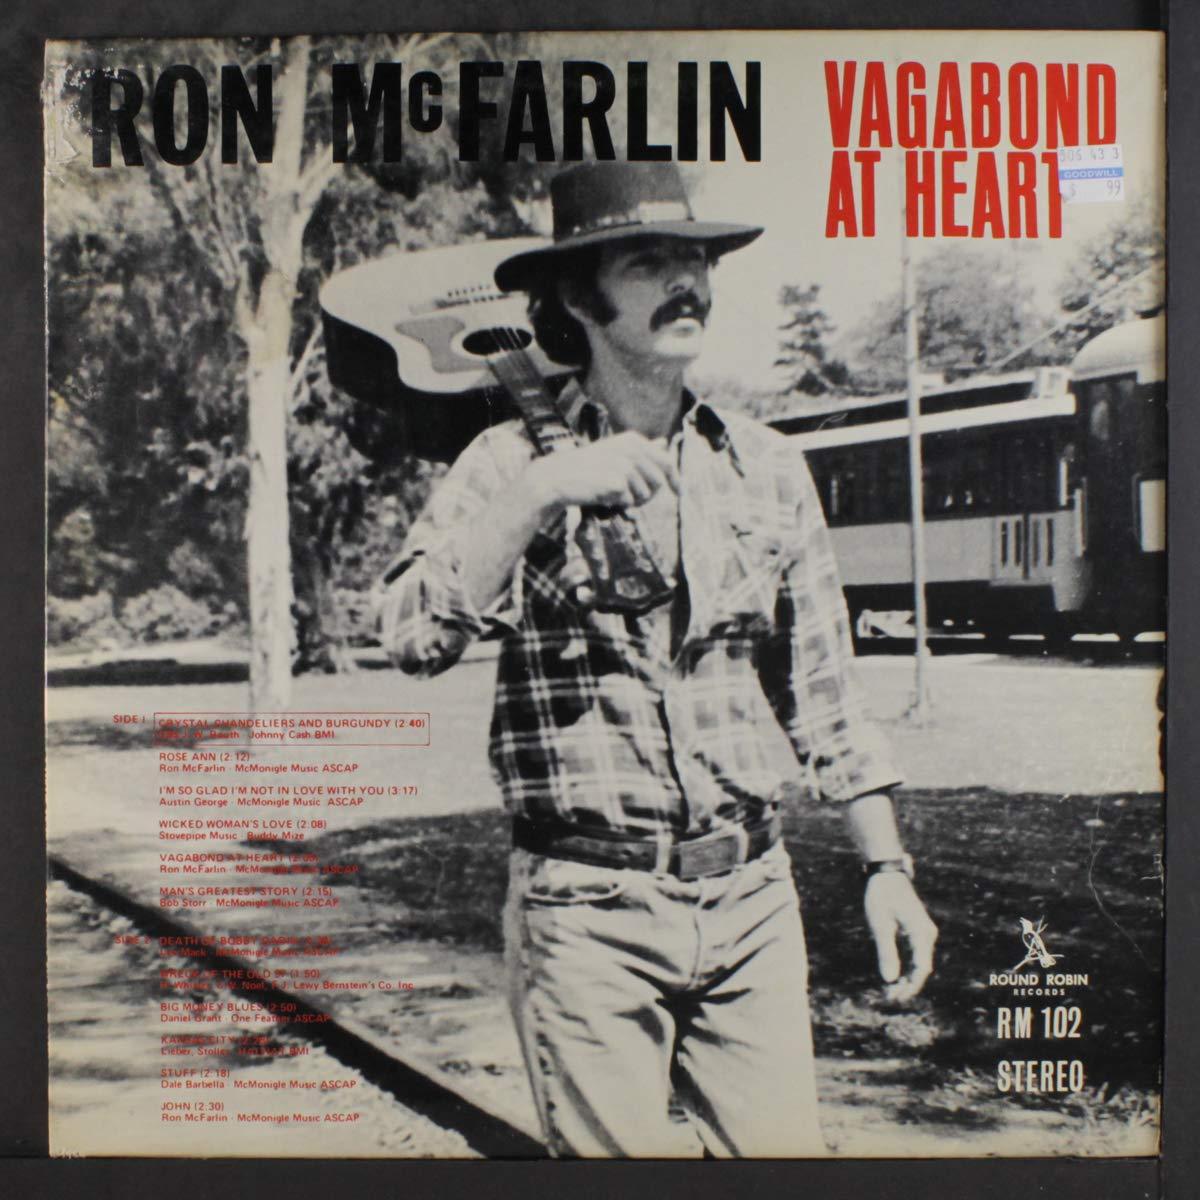 vagabond at heart: RON MCFARLIN: Amazon.es: Música